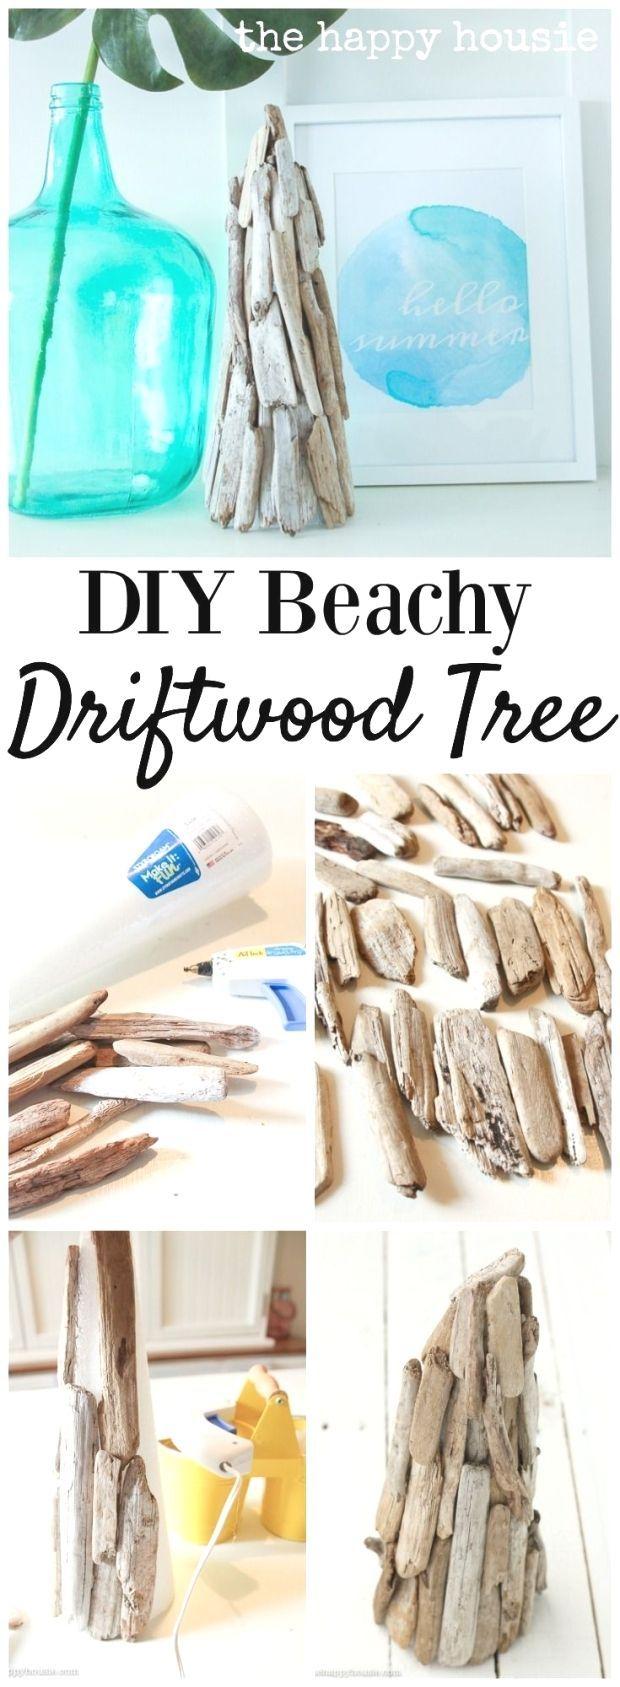 Diy Beachy Decor Driftwood Tree With Images Diy Beachy